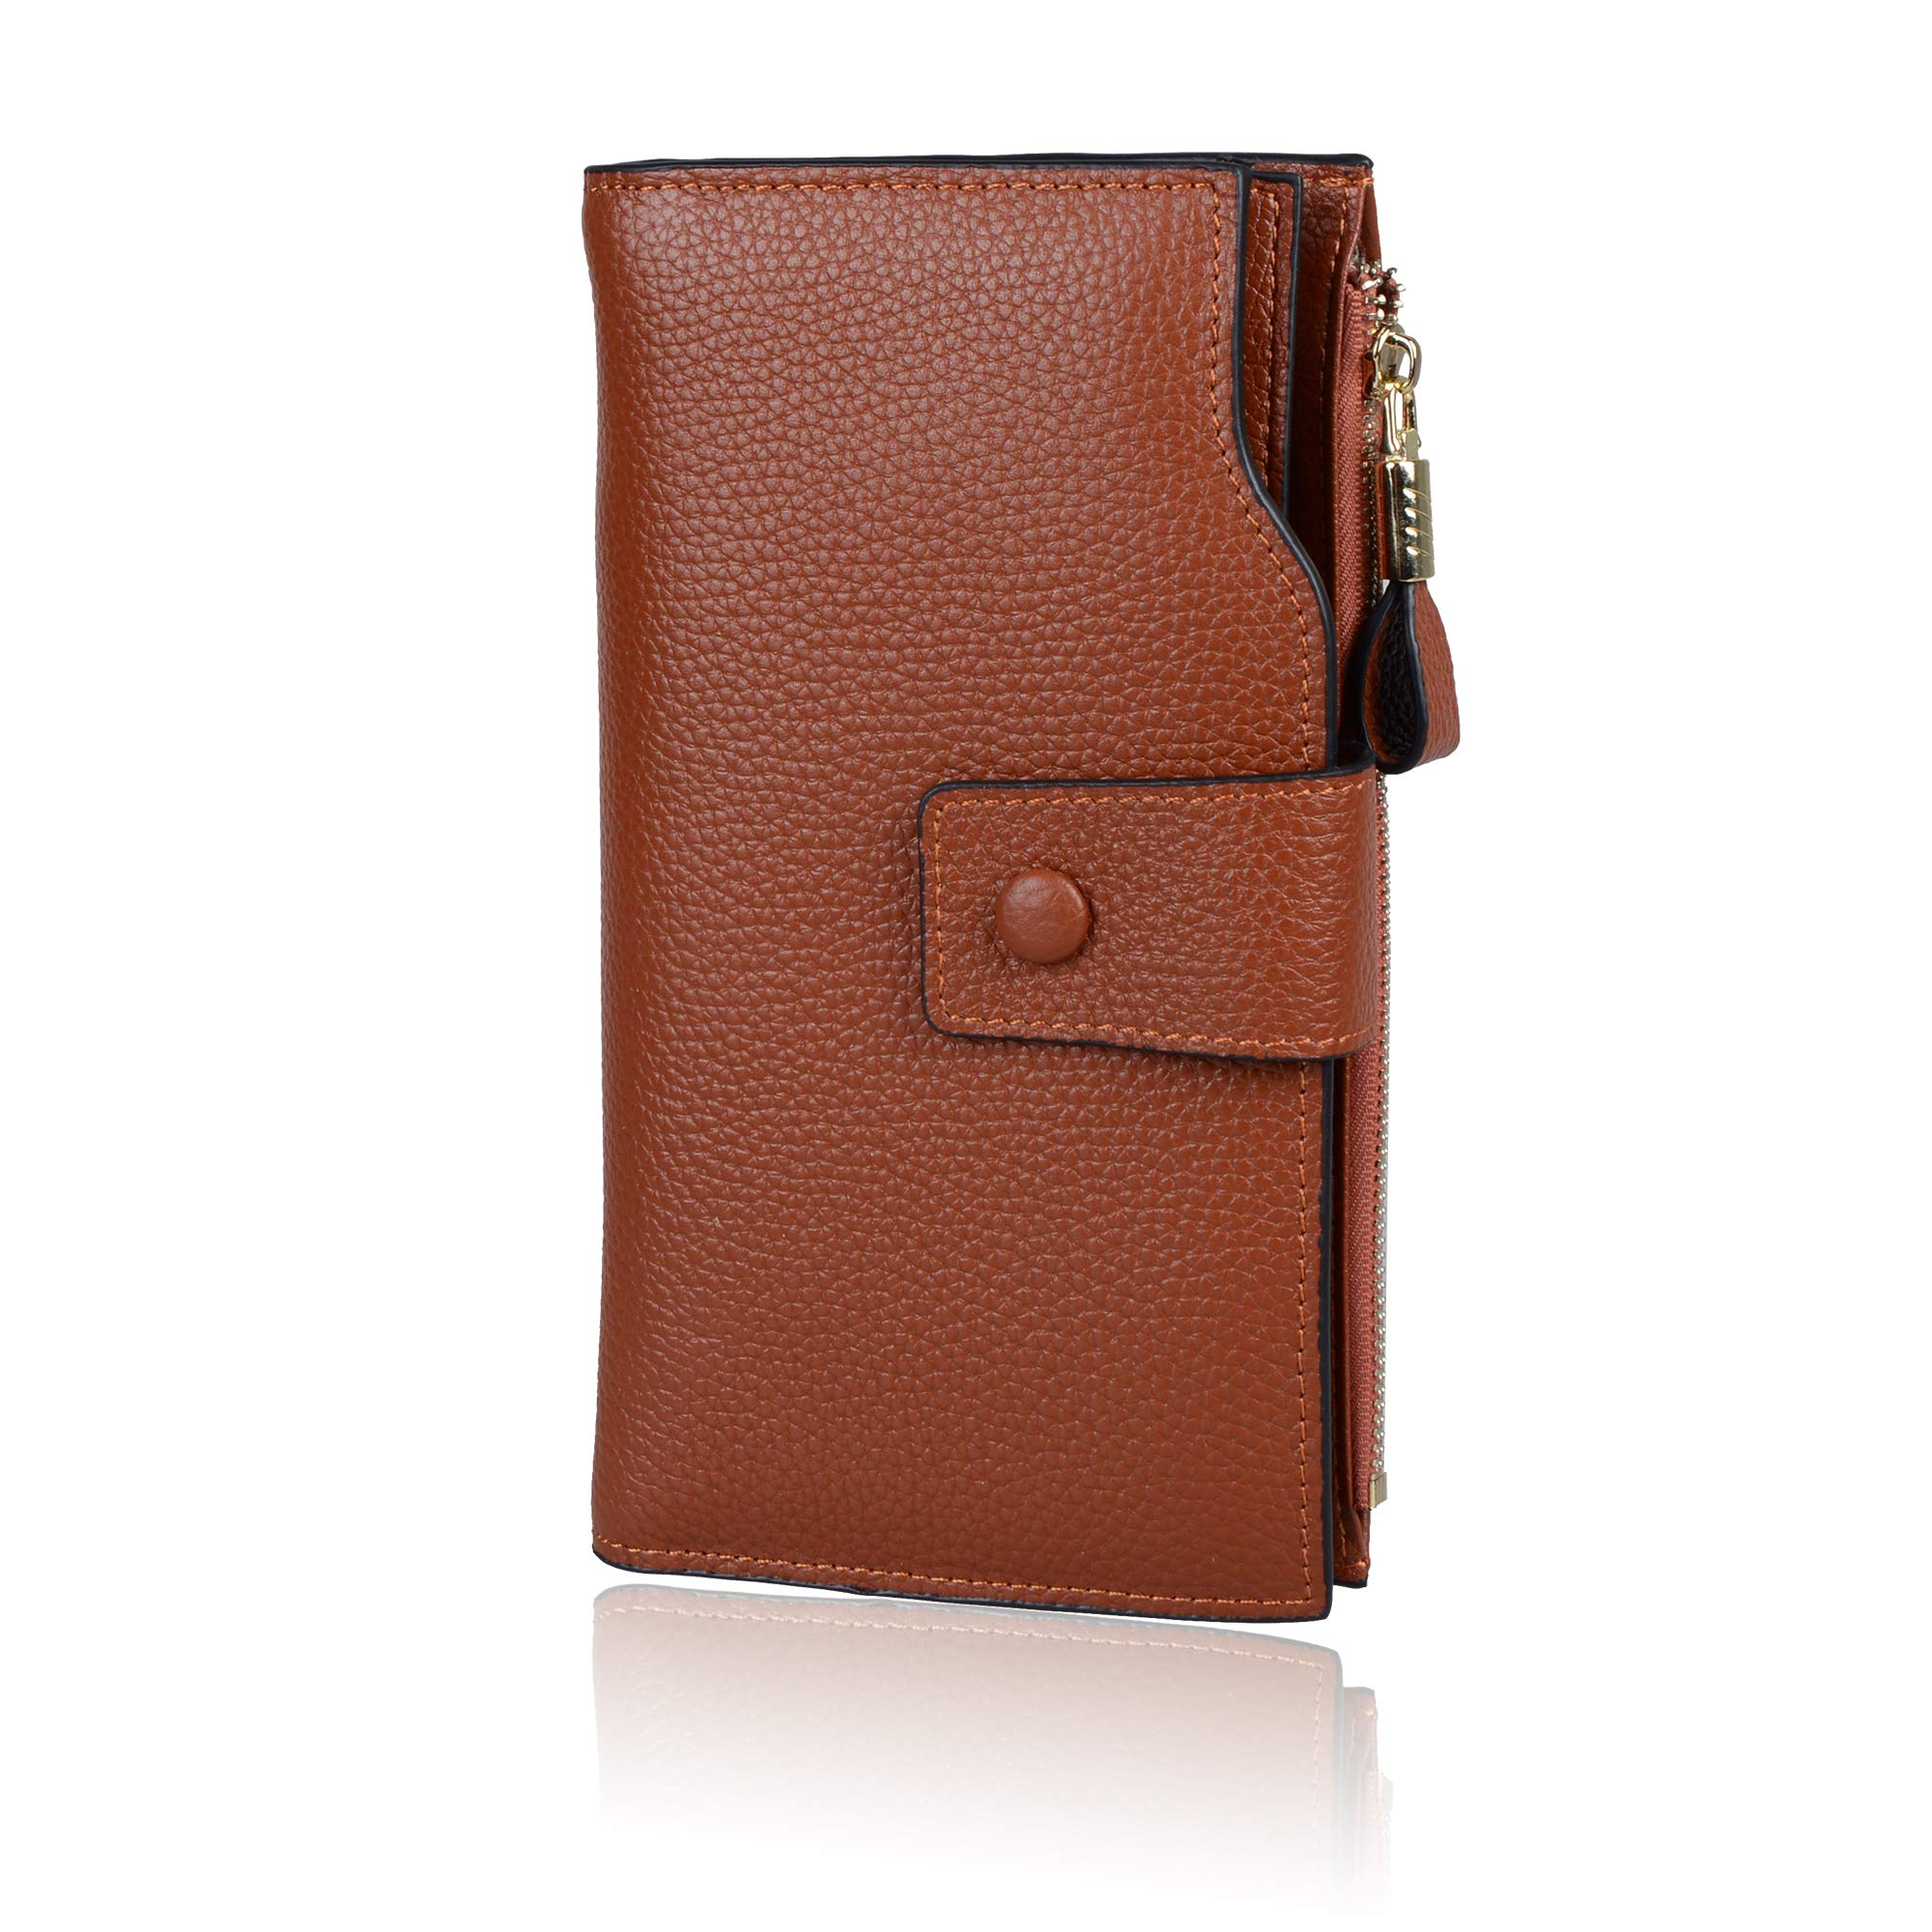 Befen Women's RFID Blocking Luxury Full Grain Genuine Leather Bifold Trifold Wallet Multi Card Organizer Holders for Ladies (Caramel Brown RFID Wallet Large)